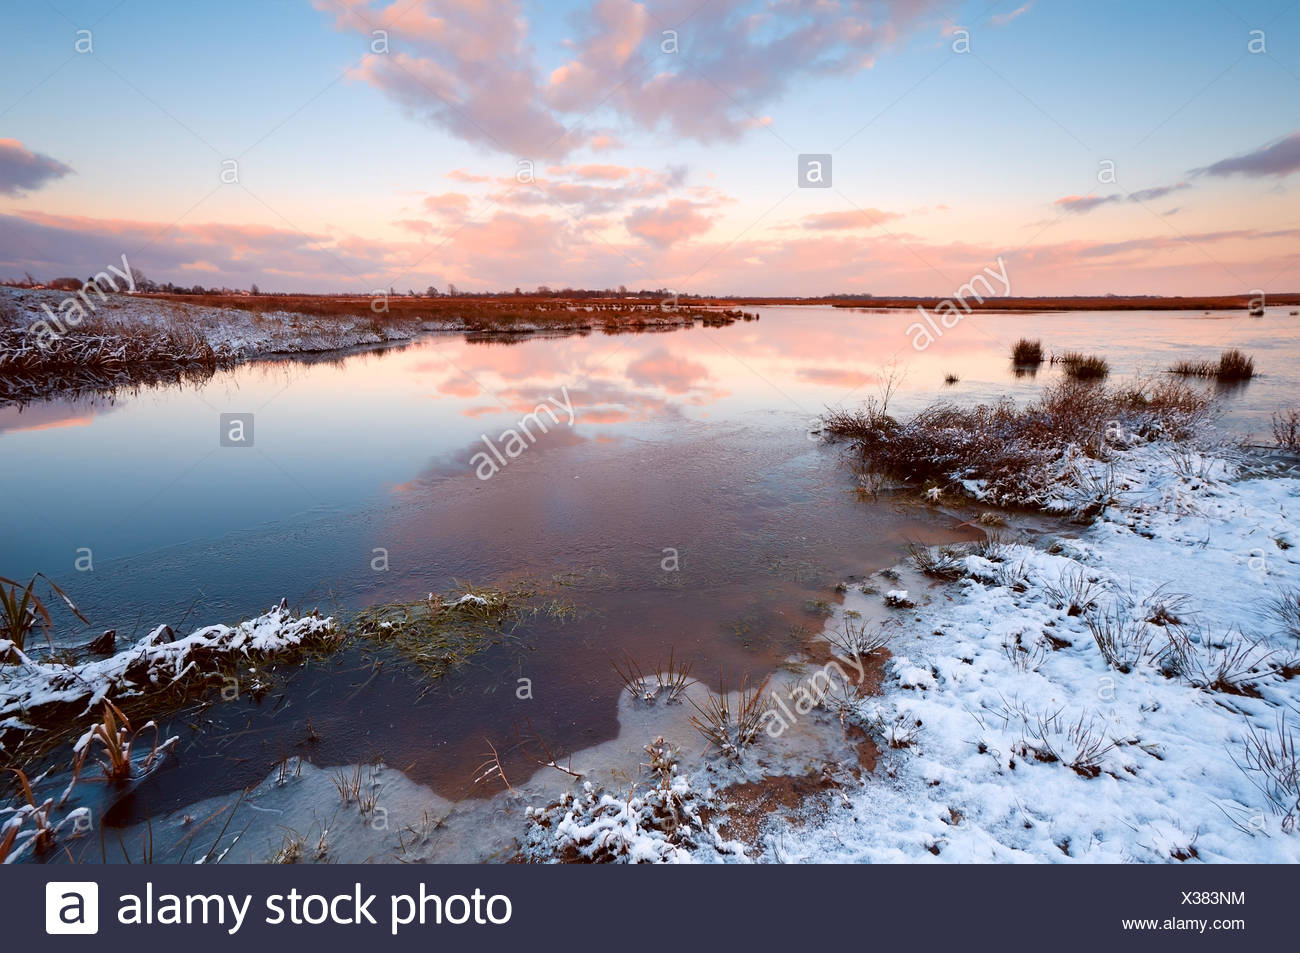 sunrsie over river in winter - Stock Image